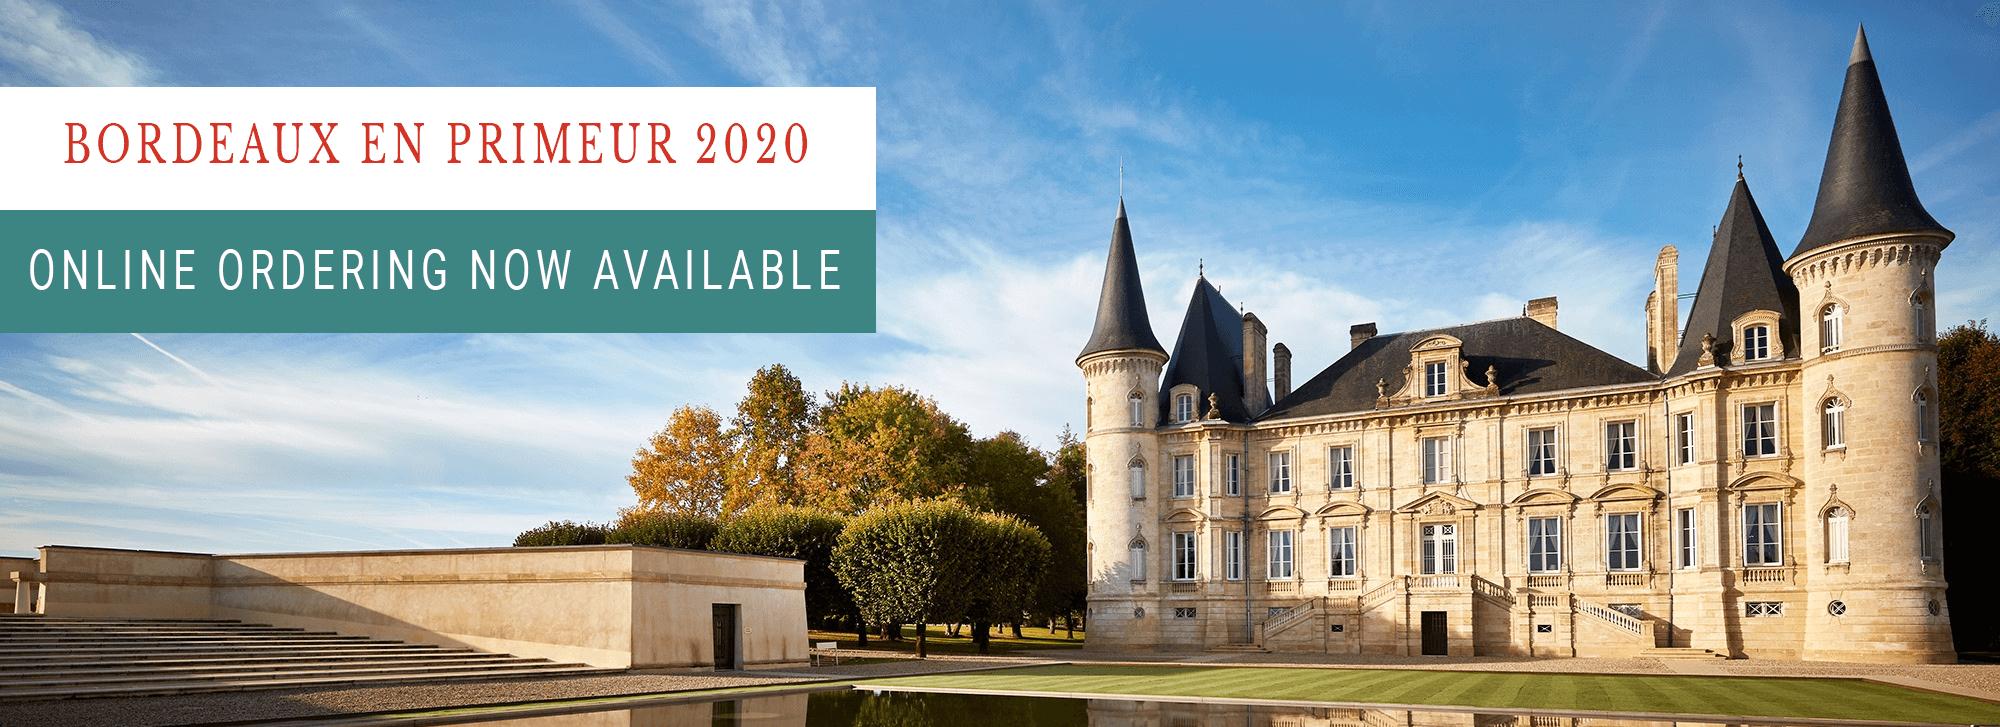 Bordeaux 2020 En Primeur Pre-order offer banner